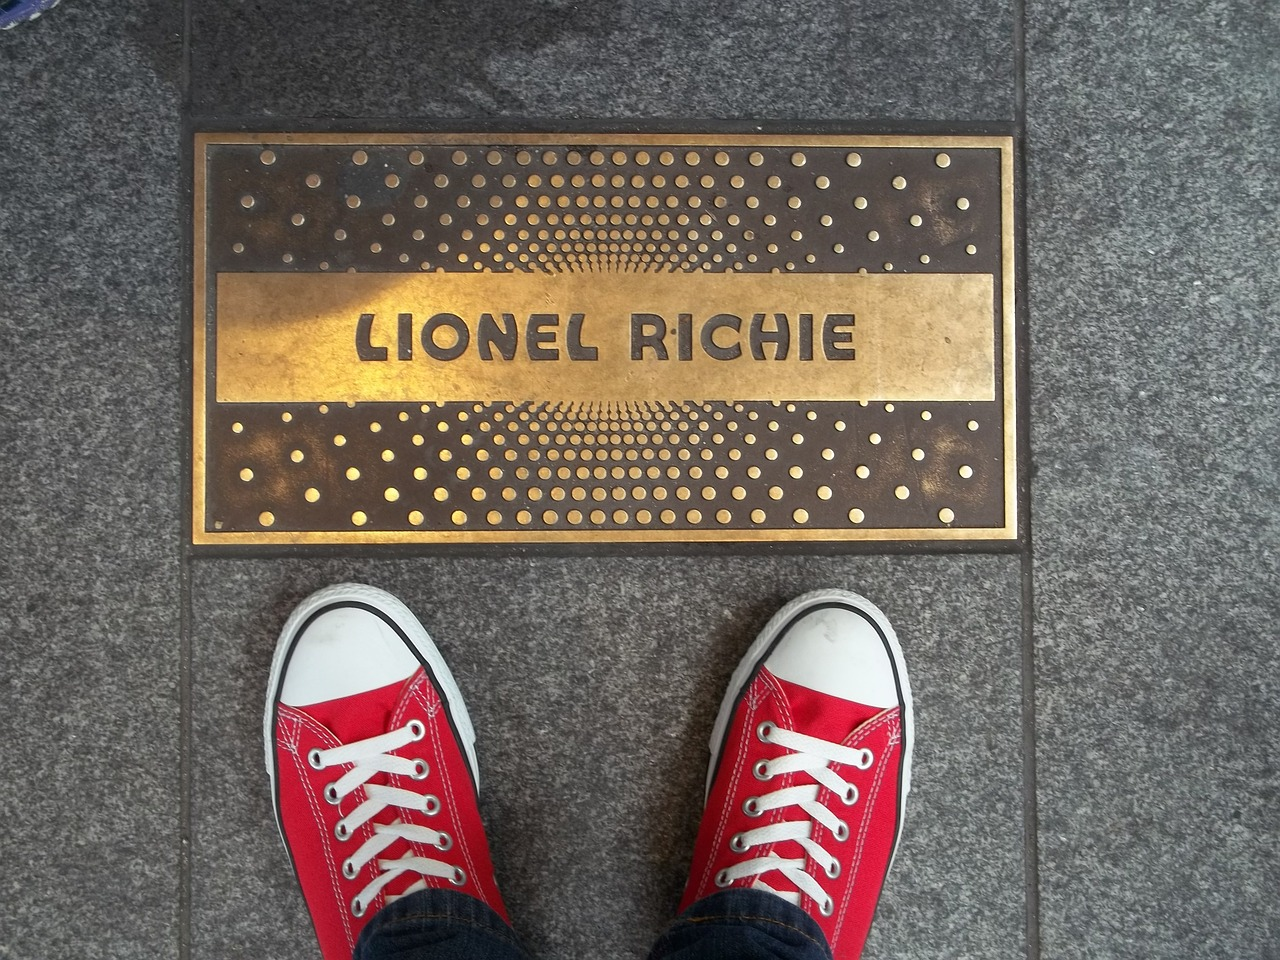 Lionel Richie Plaque.jpg